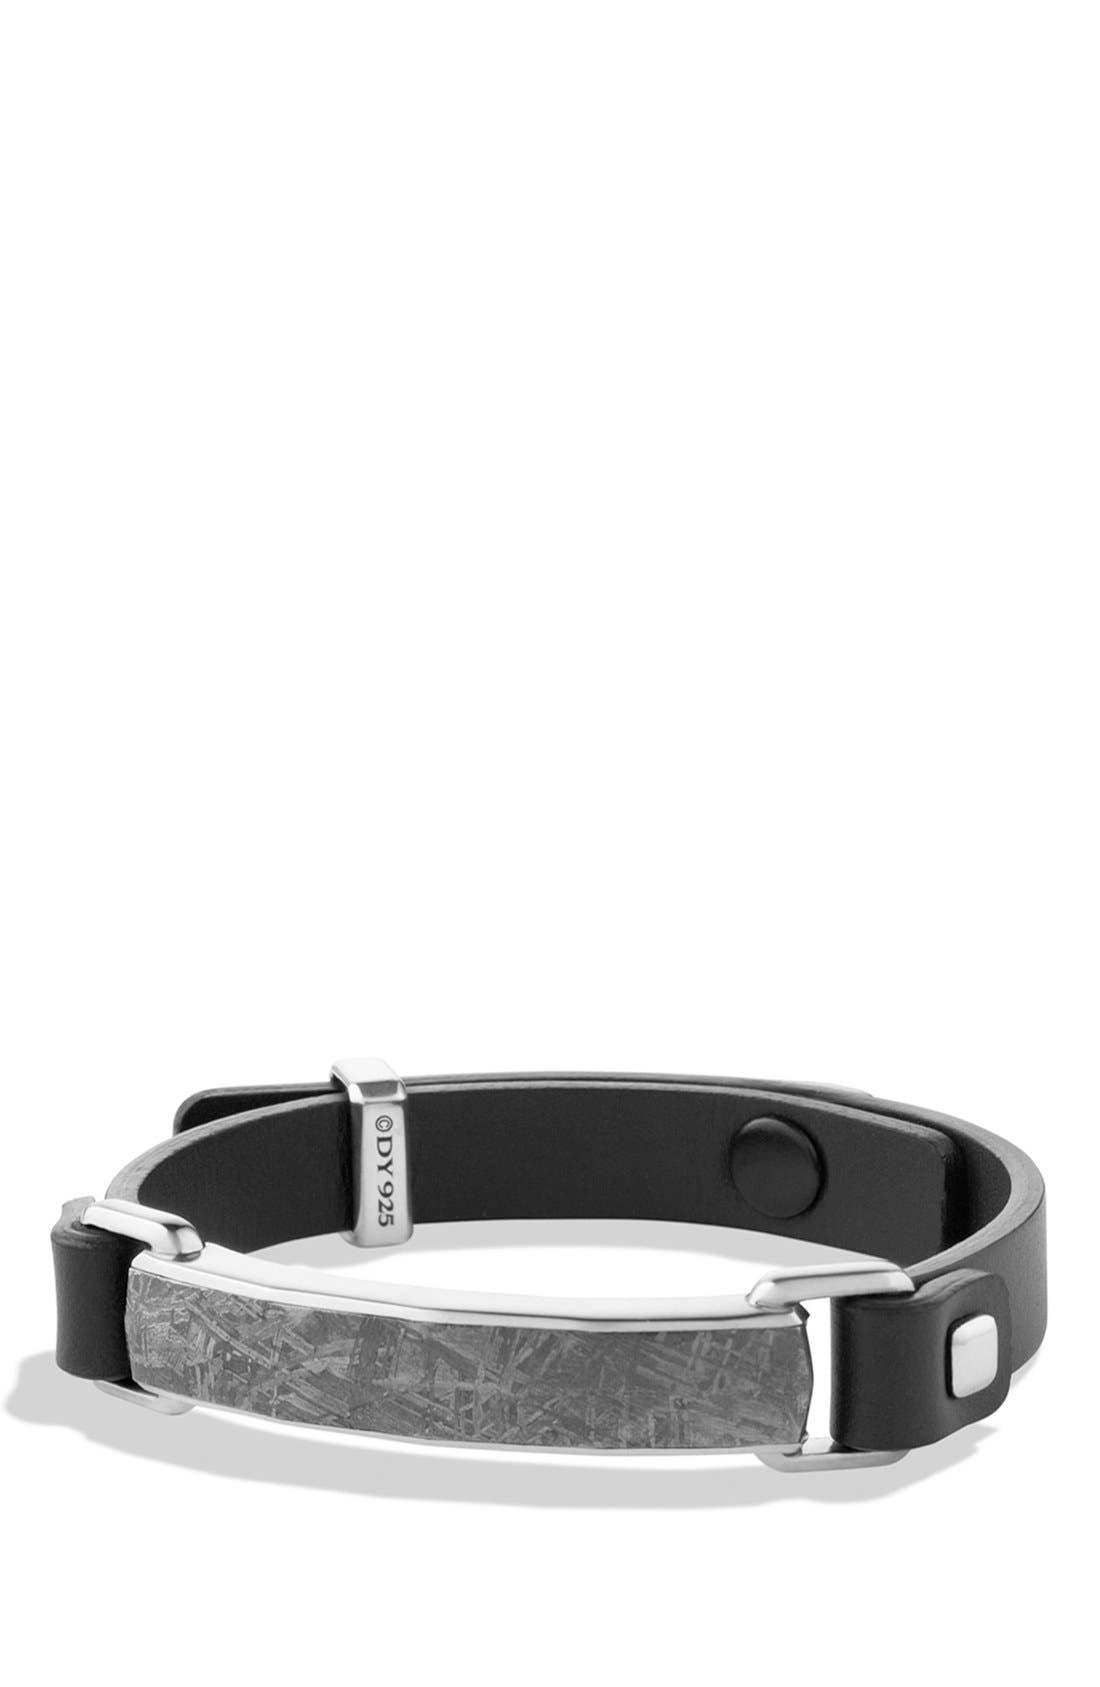 Main Image - David Yurman 'Meteorite' Leather ID Bracelet in Black